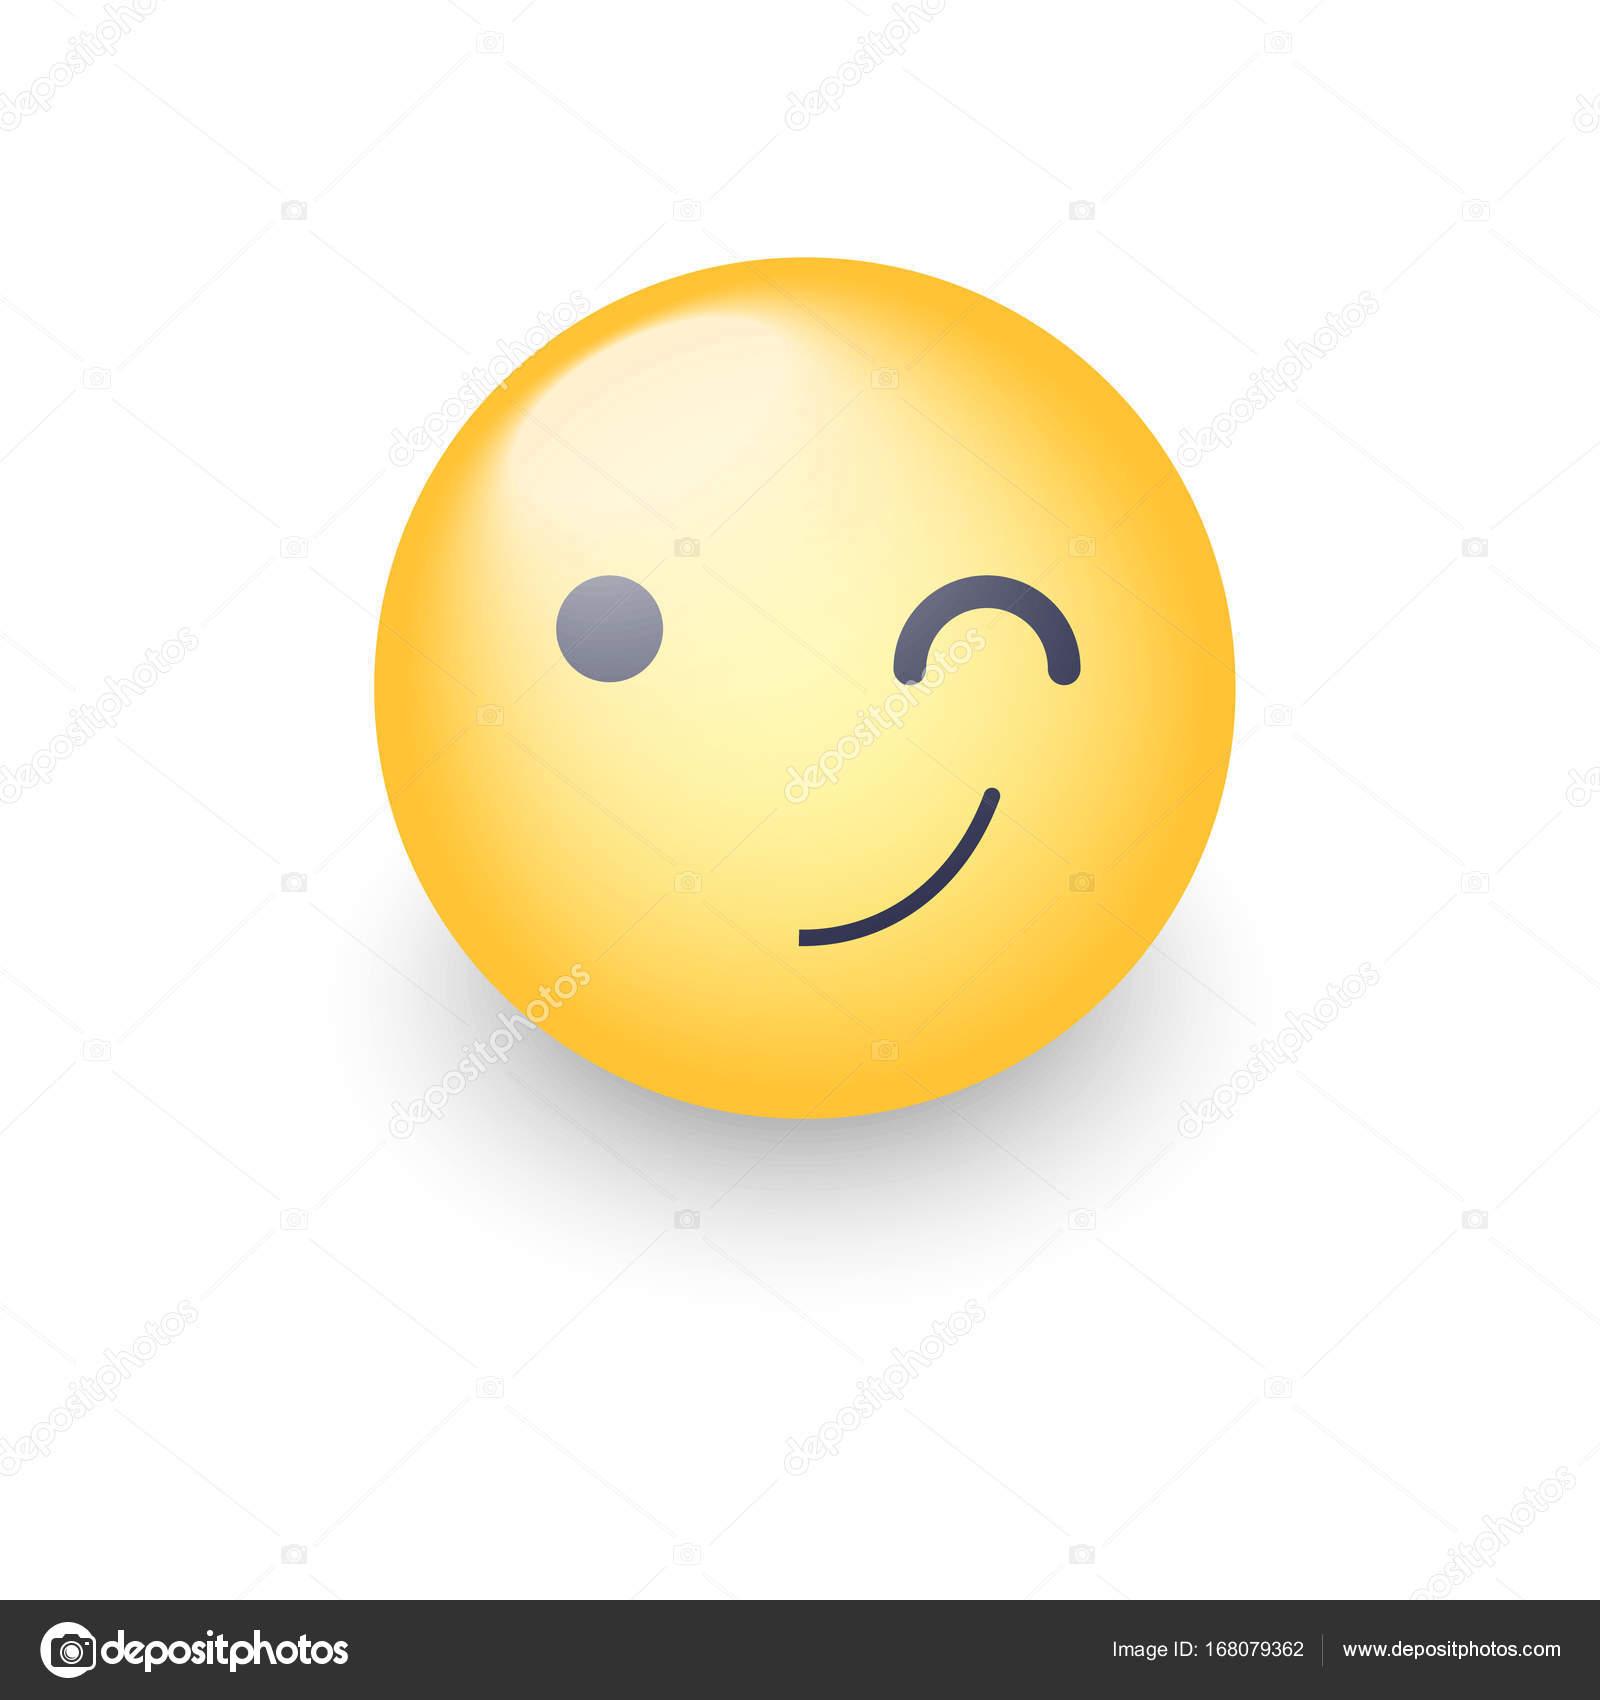 Un Clin De œil Amusant Dessin Anime Visage Emoji Clin D Oeil Et